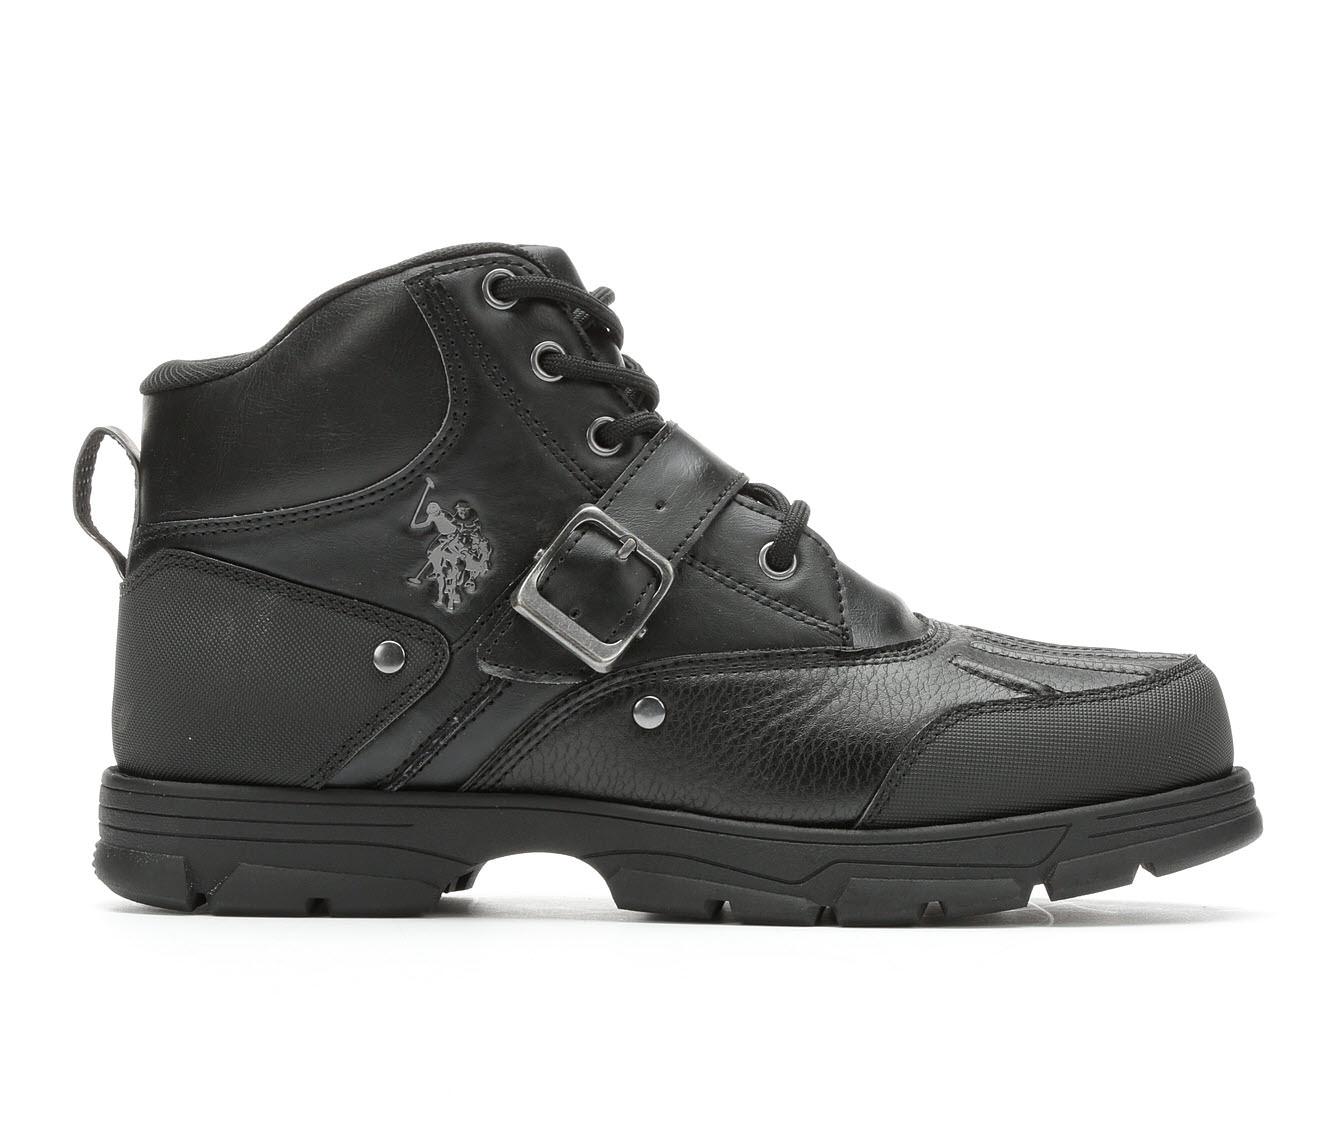 US Polo Assn Kedge Lace-Up Men's Boots (Black Faux Leather)